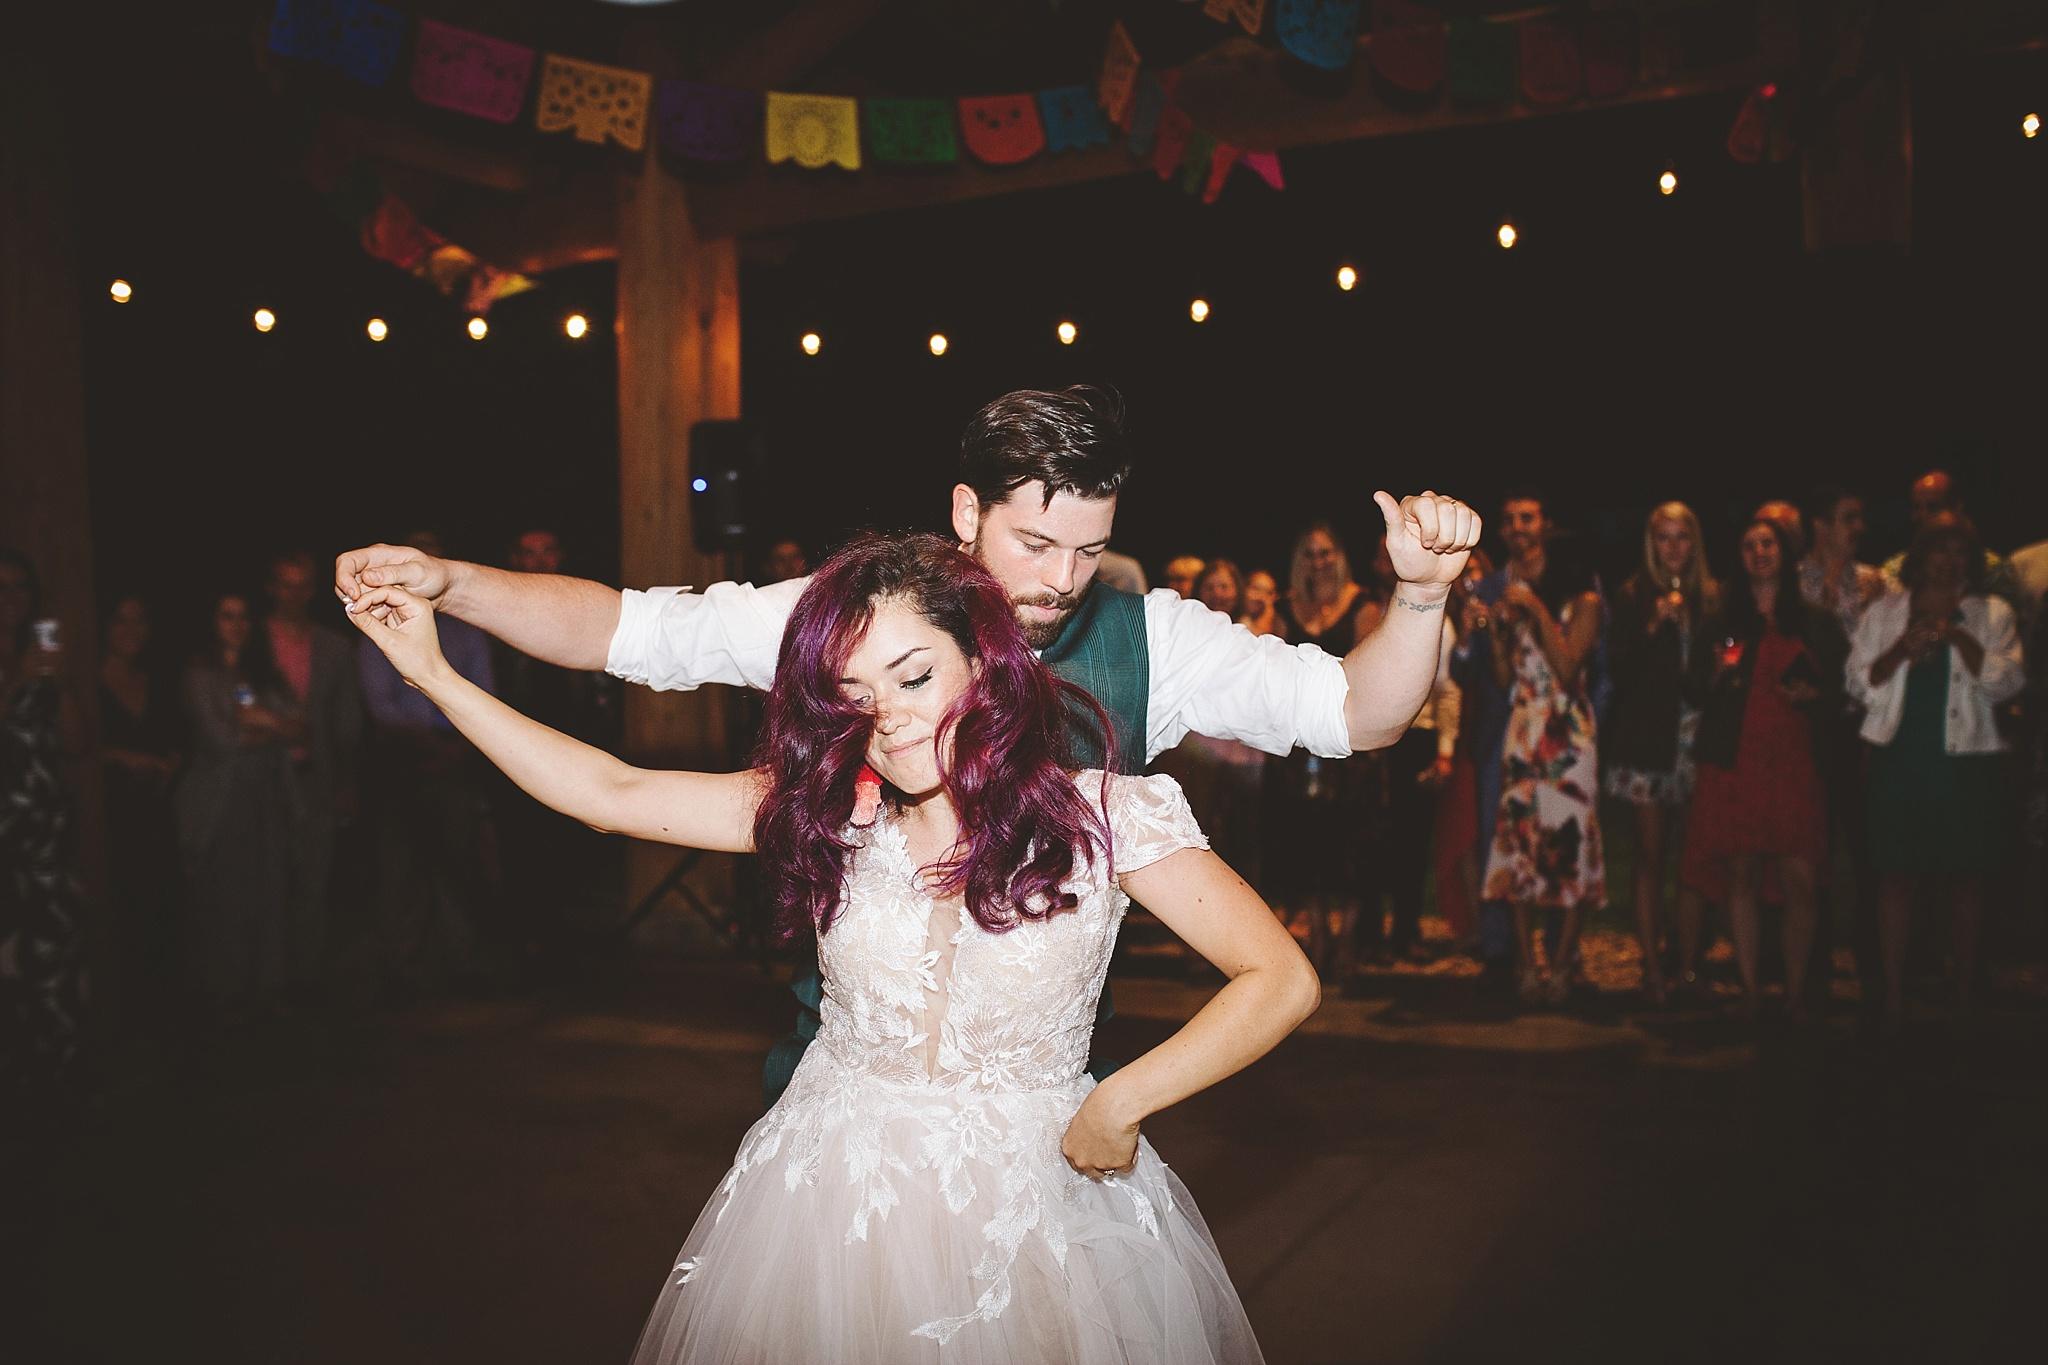 hip first wedding dance in woods